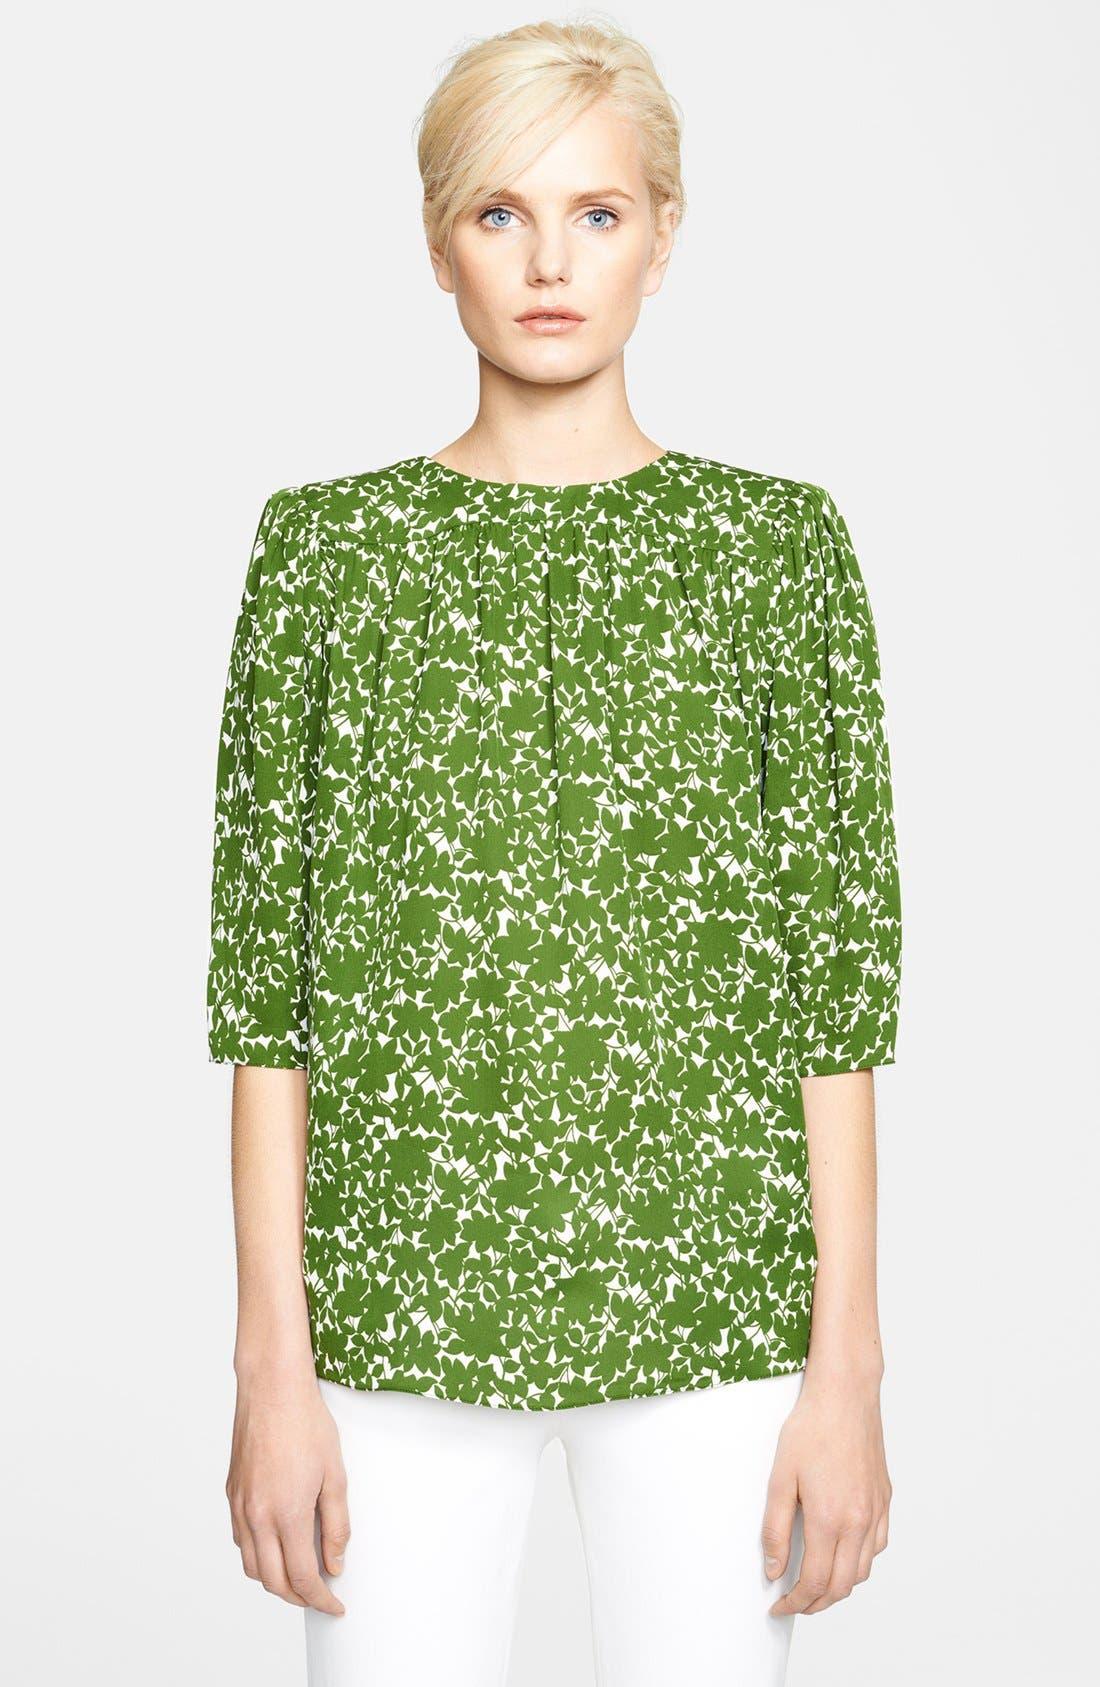 Alternate Image 1 Selected - Michael Kors Print Silk Blouse